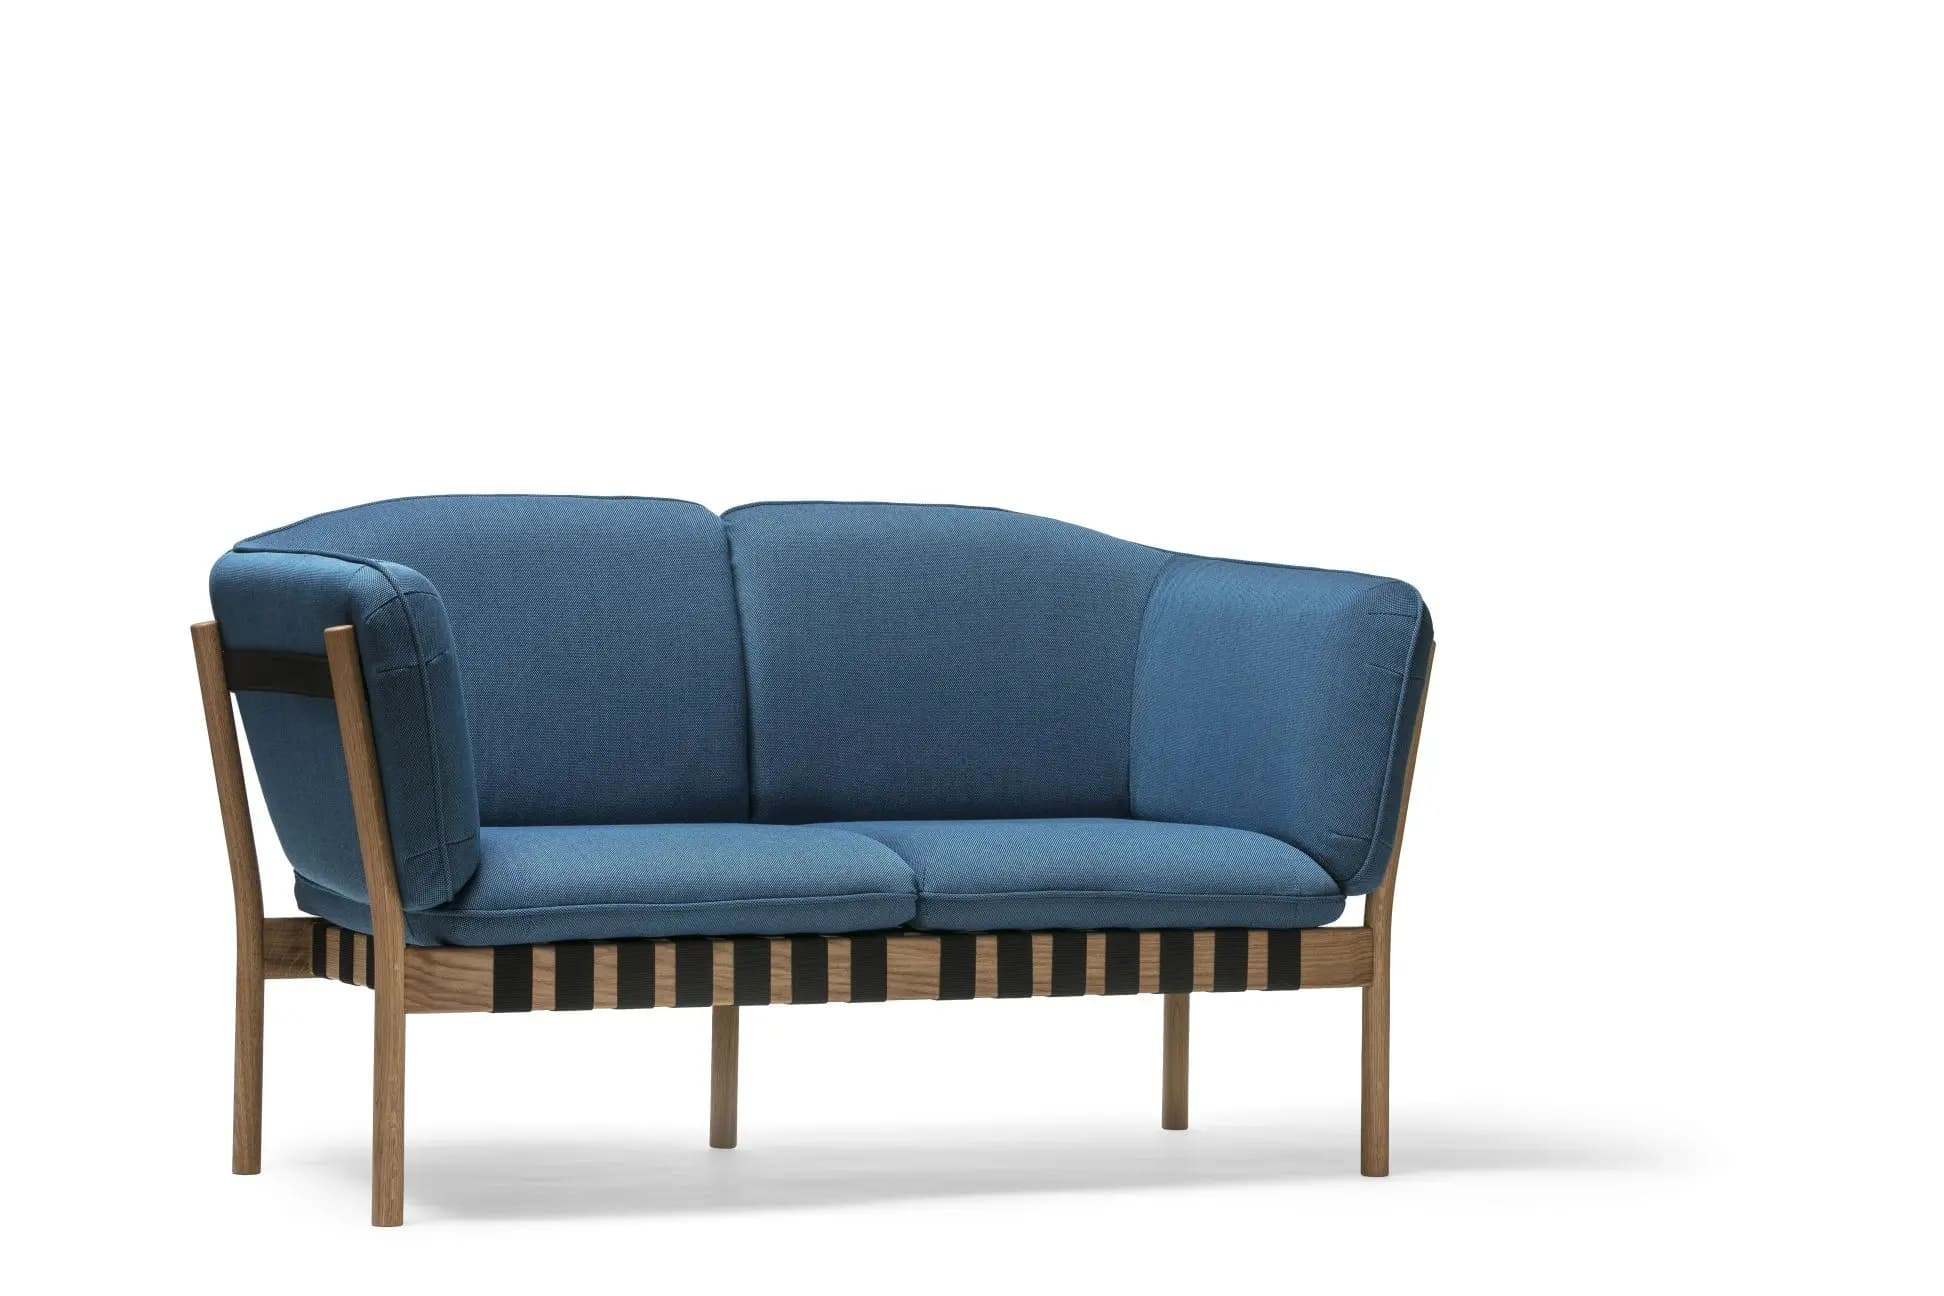 Canapea fixa tapitata cu stofa, 2 locuri, Dowel Albastru / Natural, l147xA76,5xH85 cm